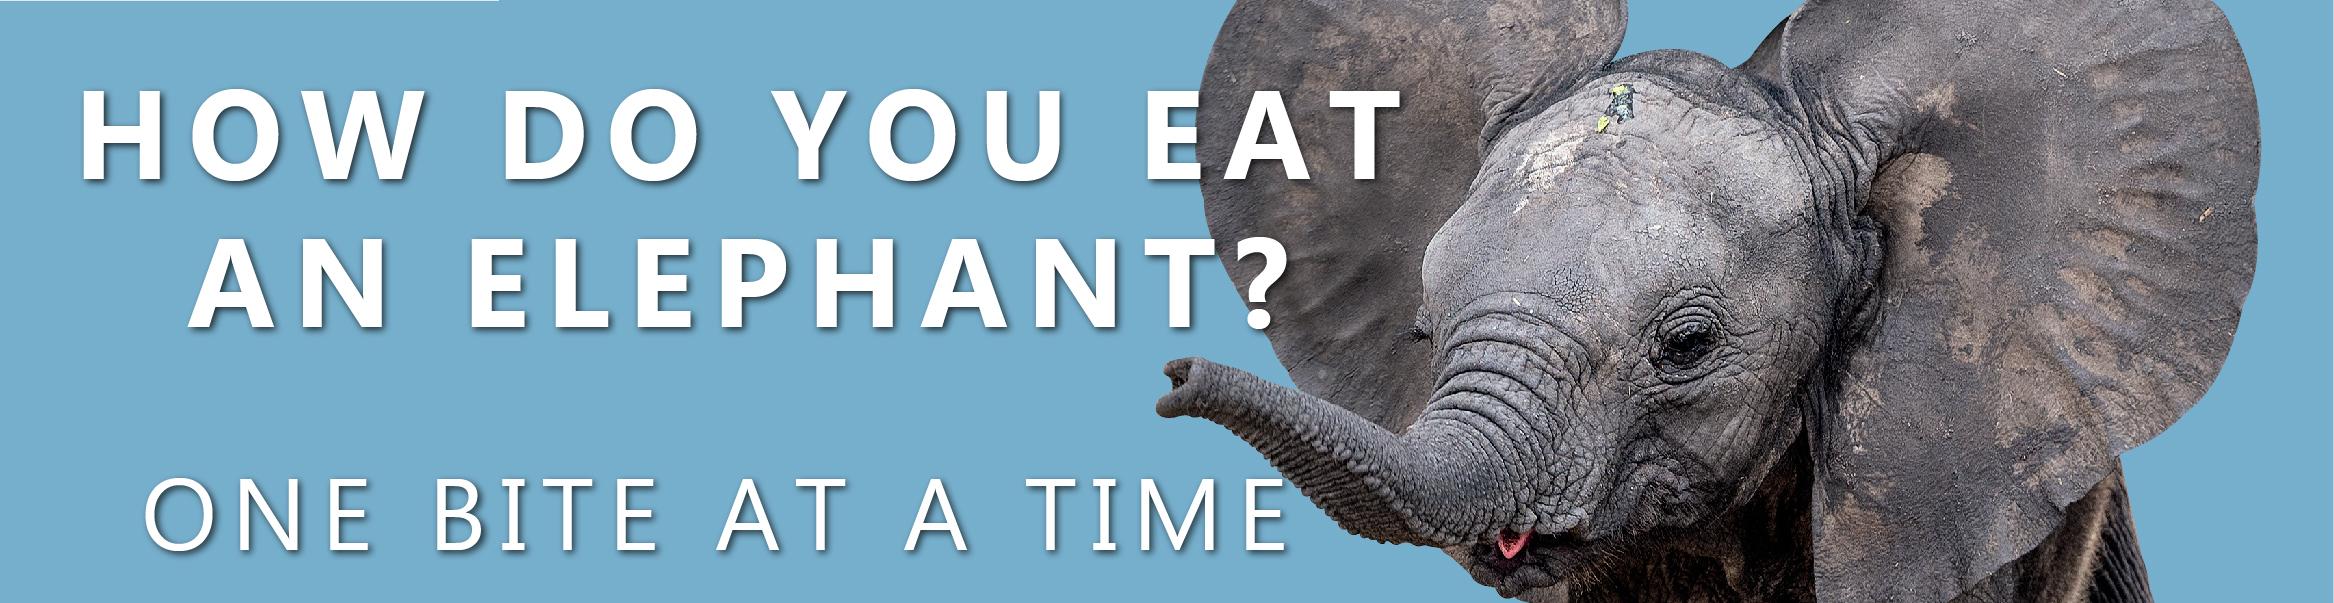 how do you eat an elephant - Cogo Capital